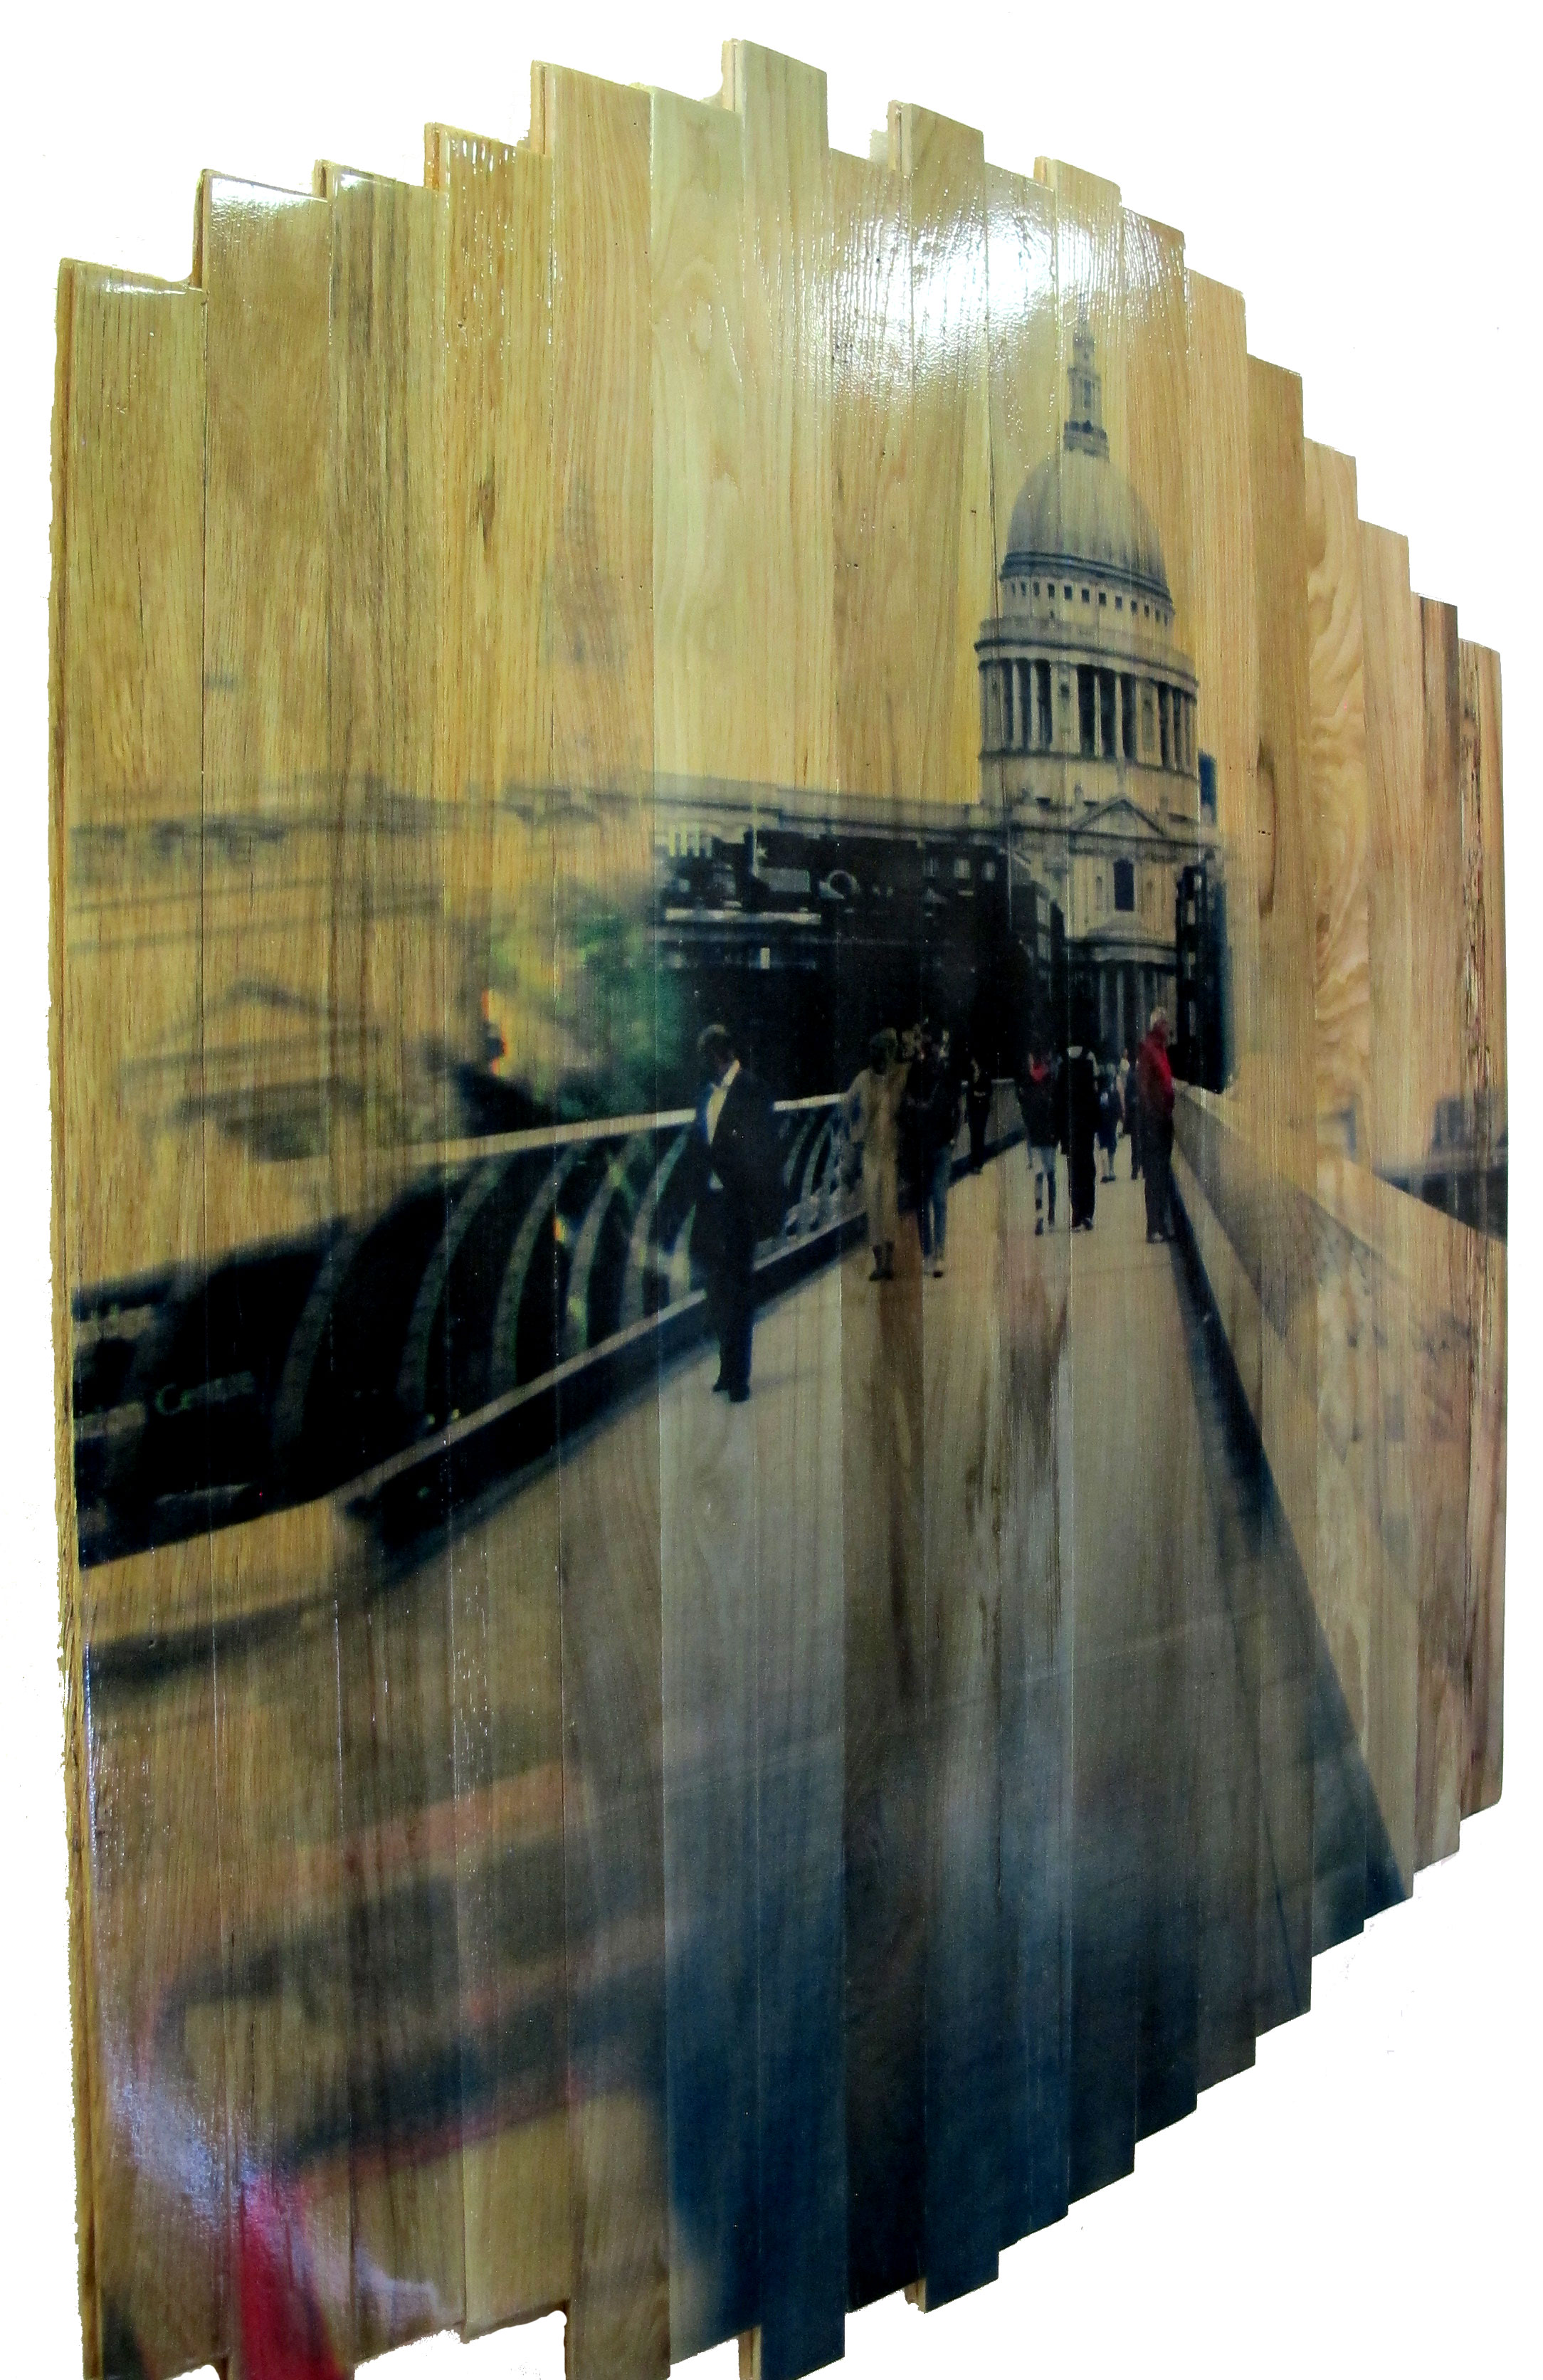 St. Paul's View,  2016 c print on reclaimed wood floor 48 x 41 x 1.5 in / 122 x 105 x 4 cm  Unique